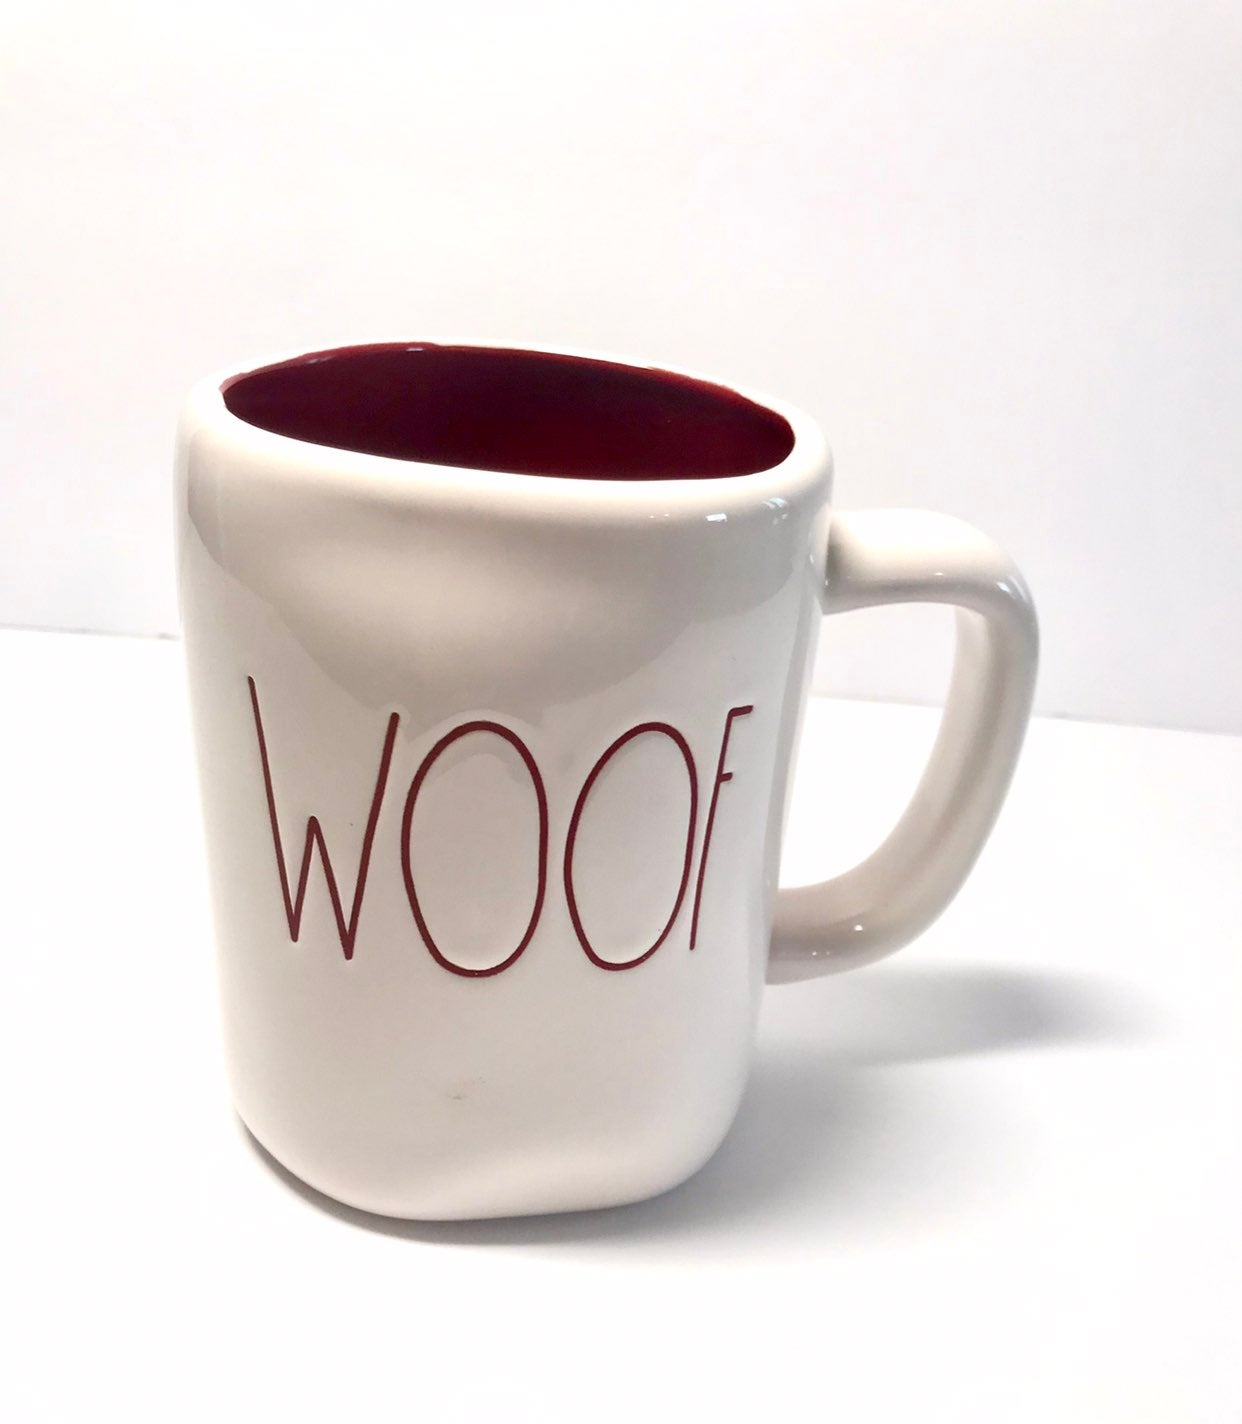 Rae Dunn WOOF mug